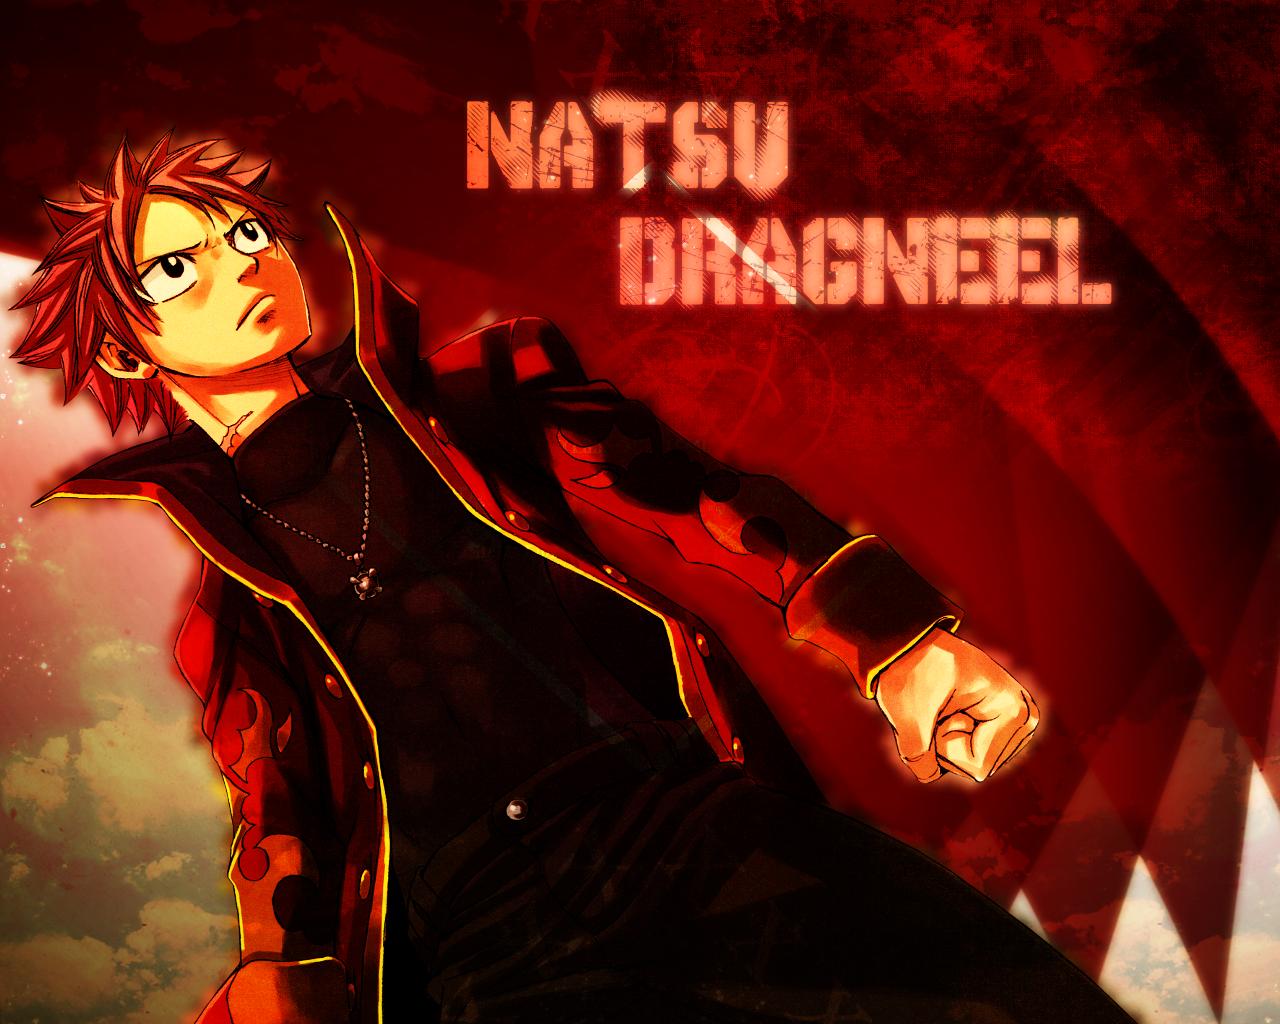 Fairy Tail Natsu Dragneel   WALLPAPER by Silas Tsunayoshi on 1280x1024